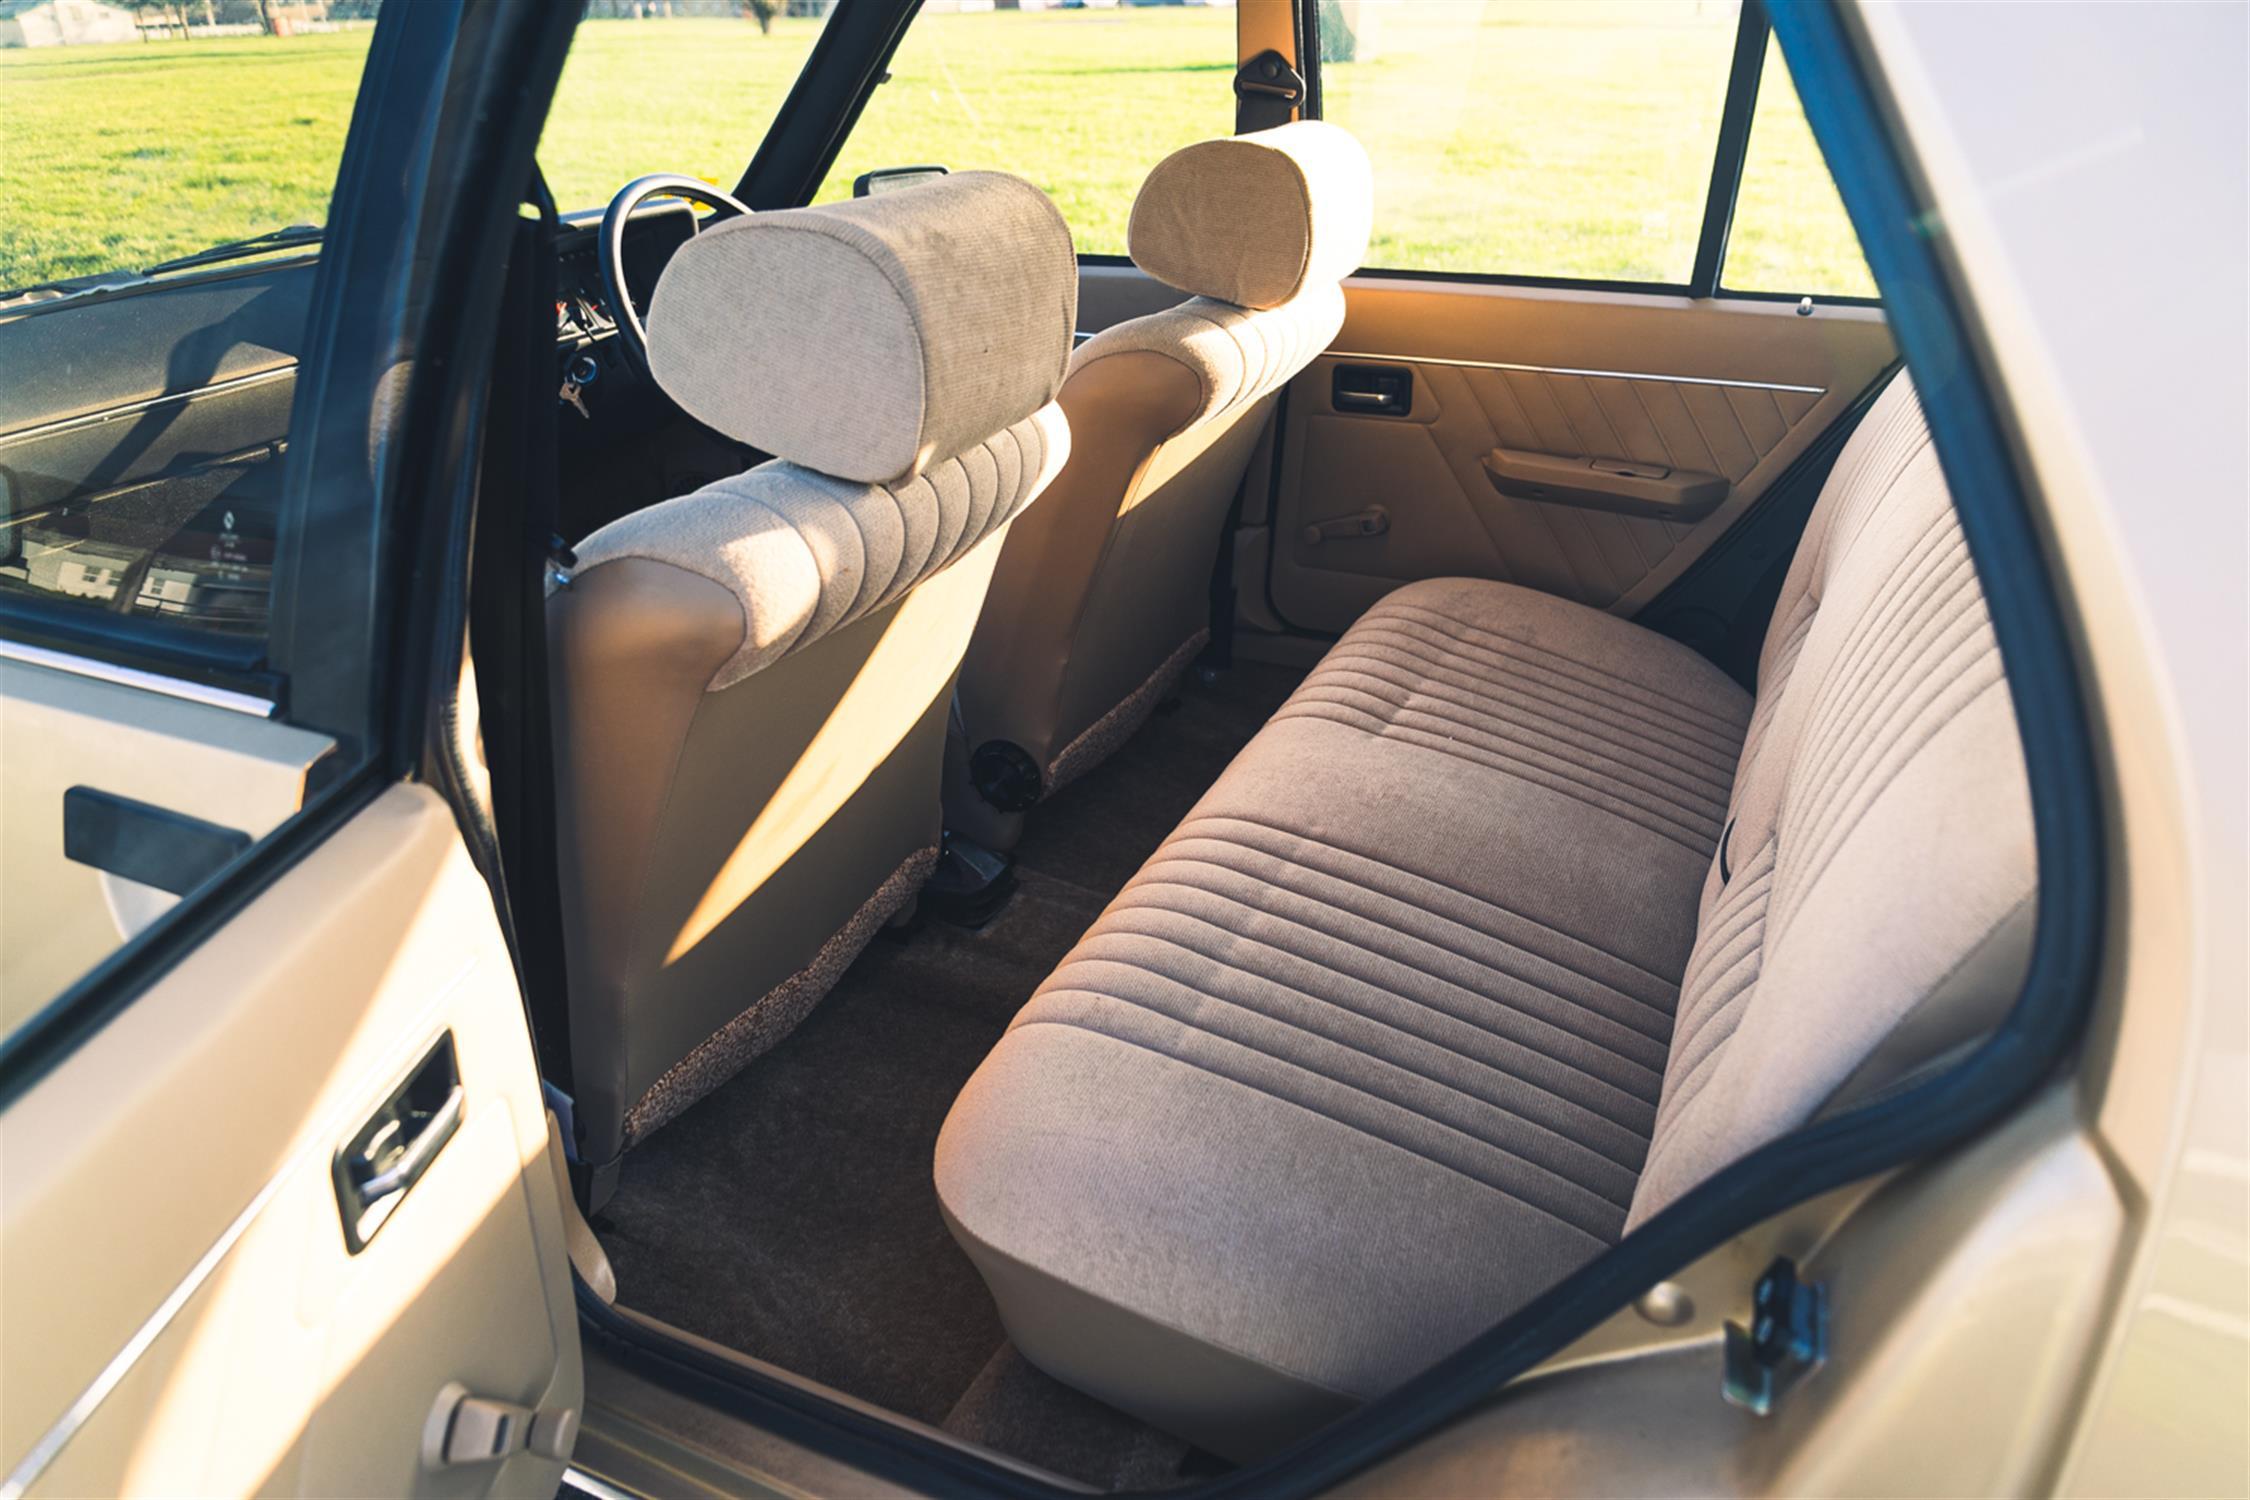 1983 Renault 18 GTL Estate - Image 9 of 32